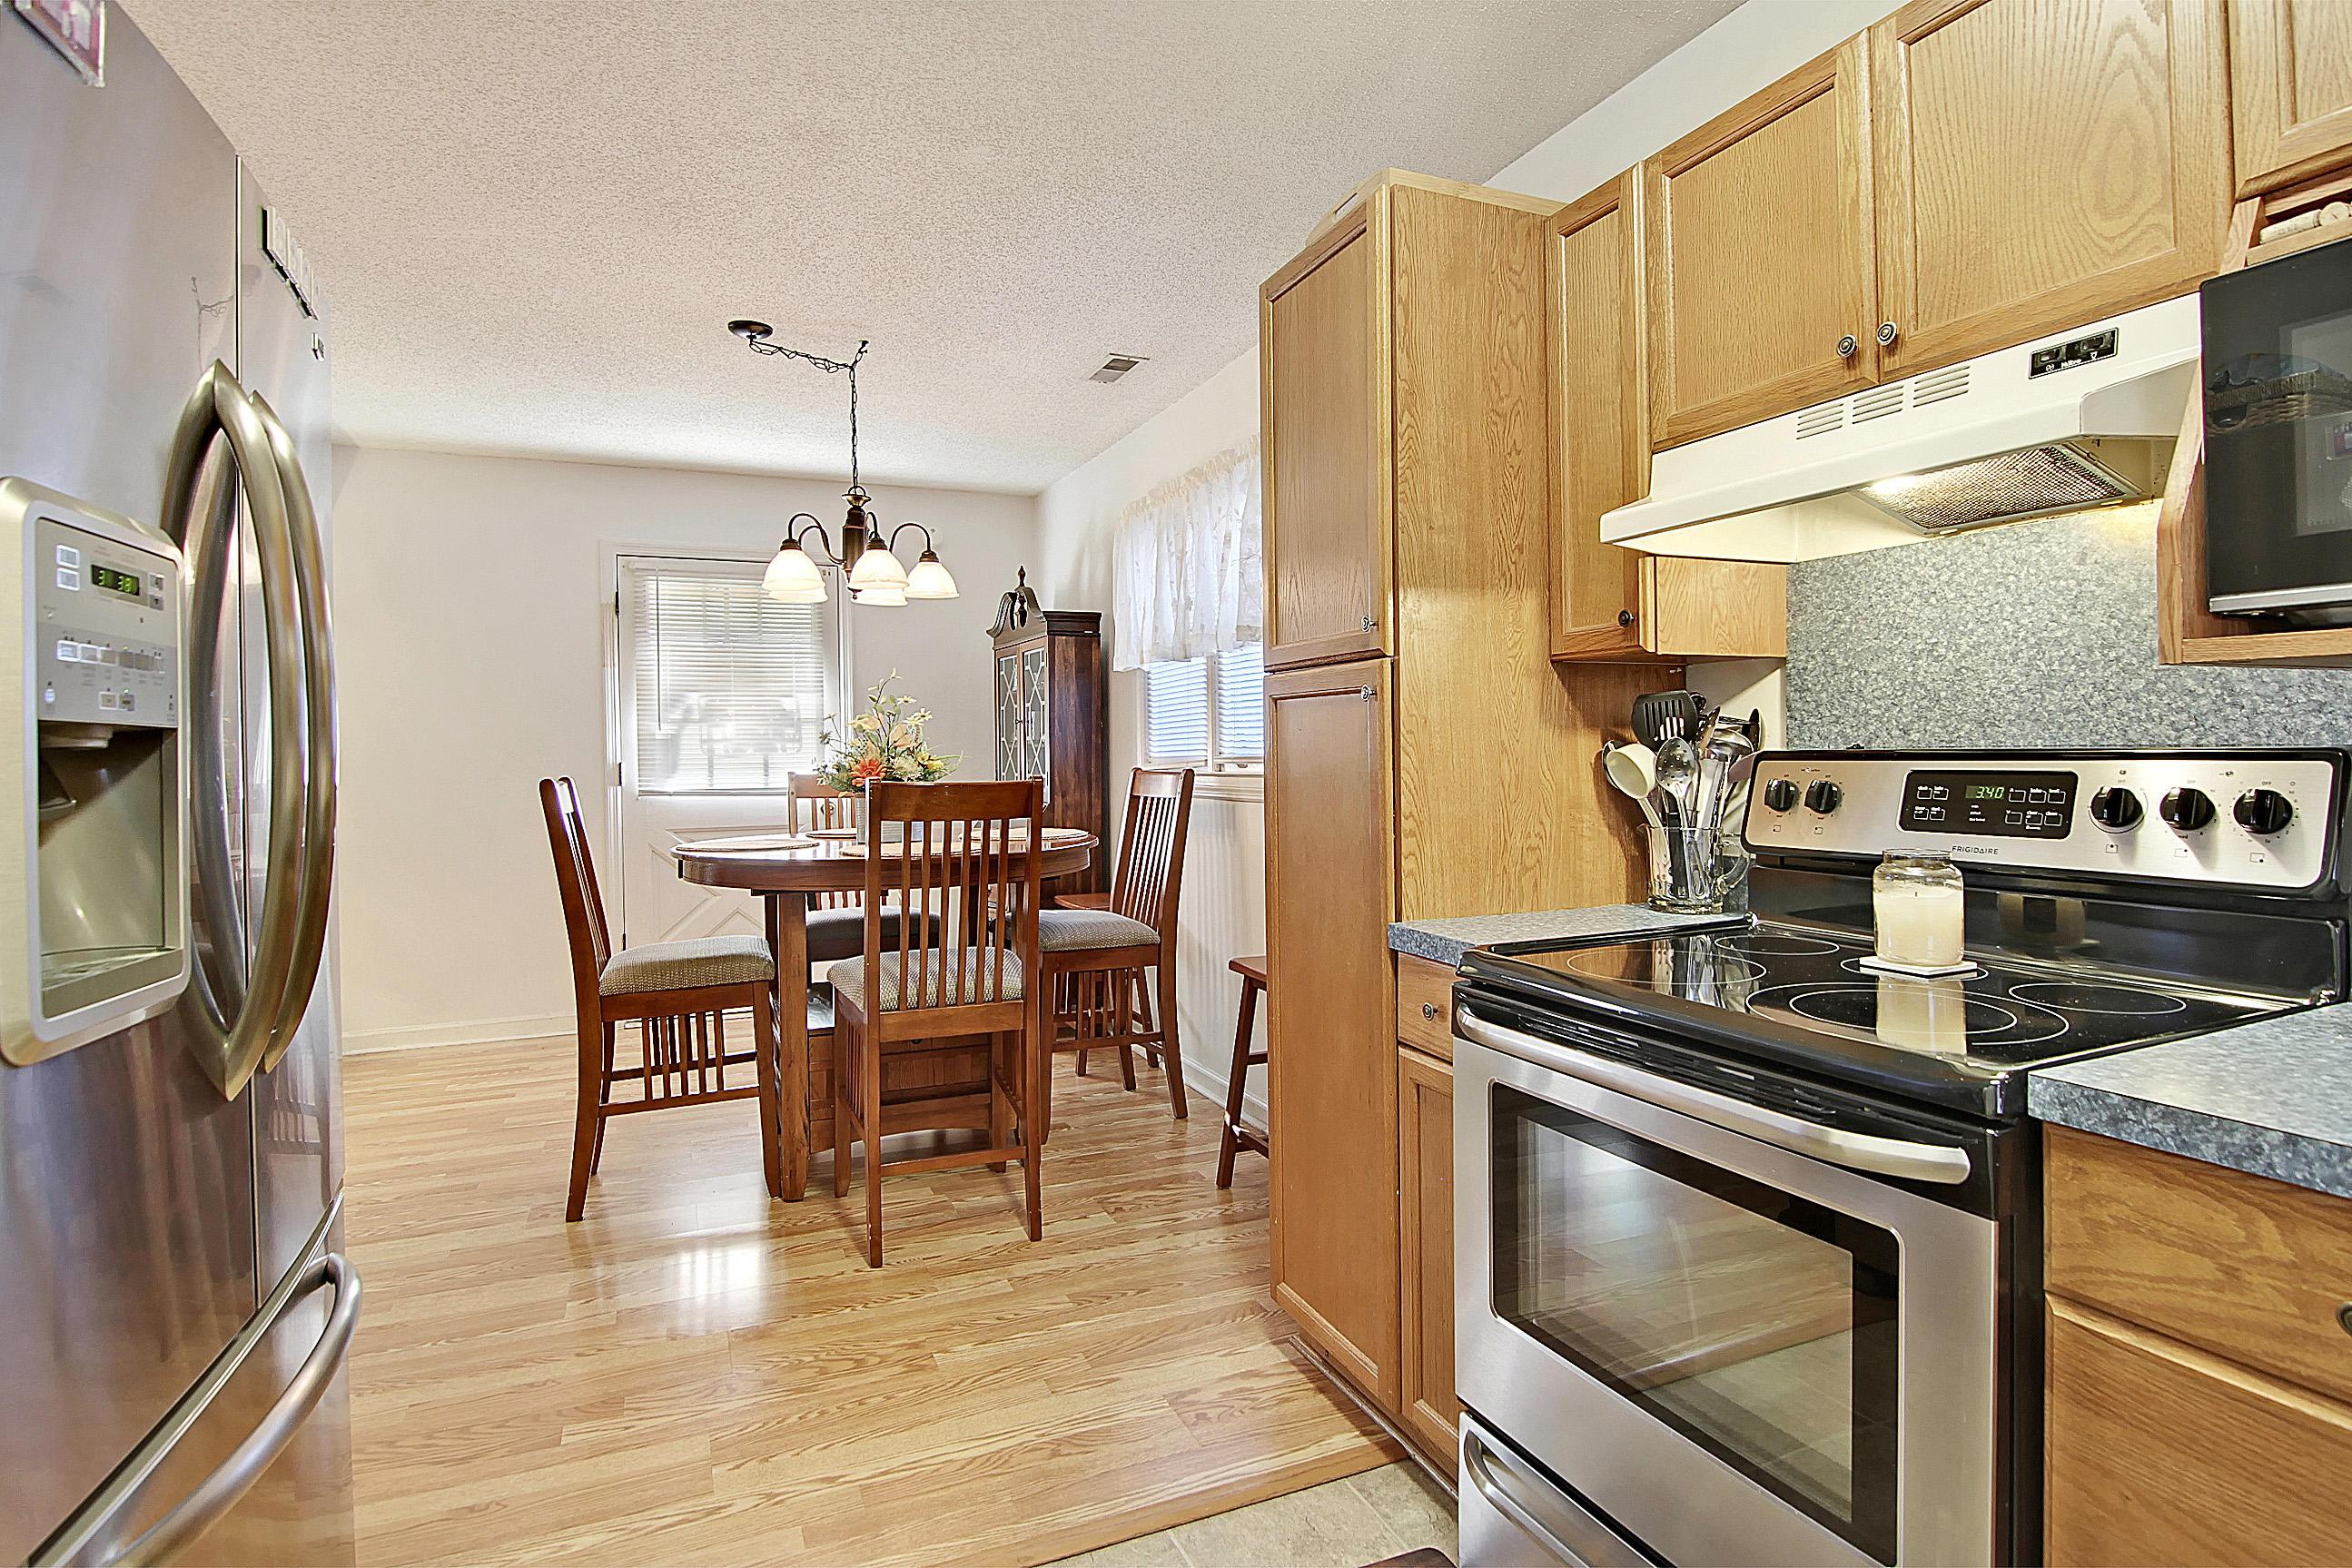 Rainbow Acres Homes For Sale - 428 Rainbow Acres, Moncks Corner, SC - 53